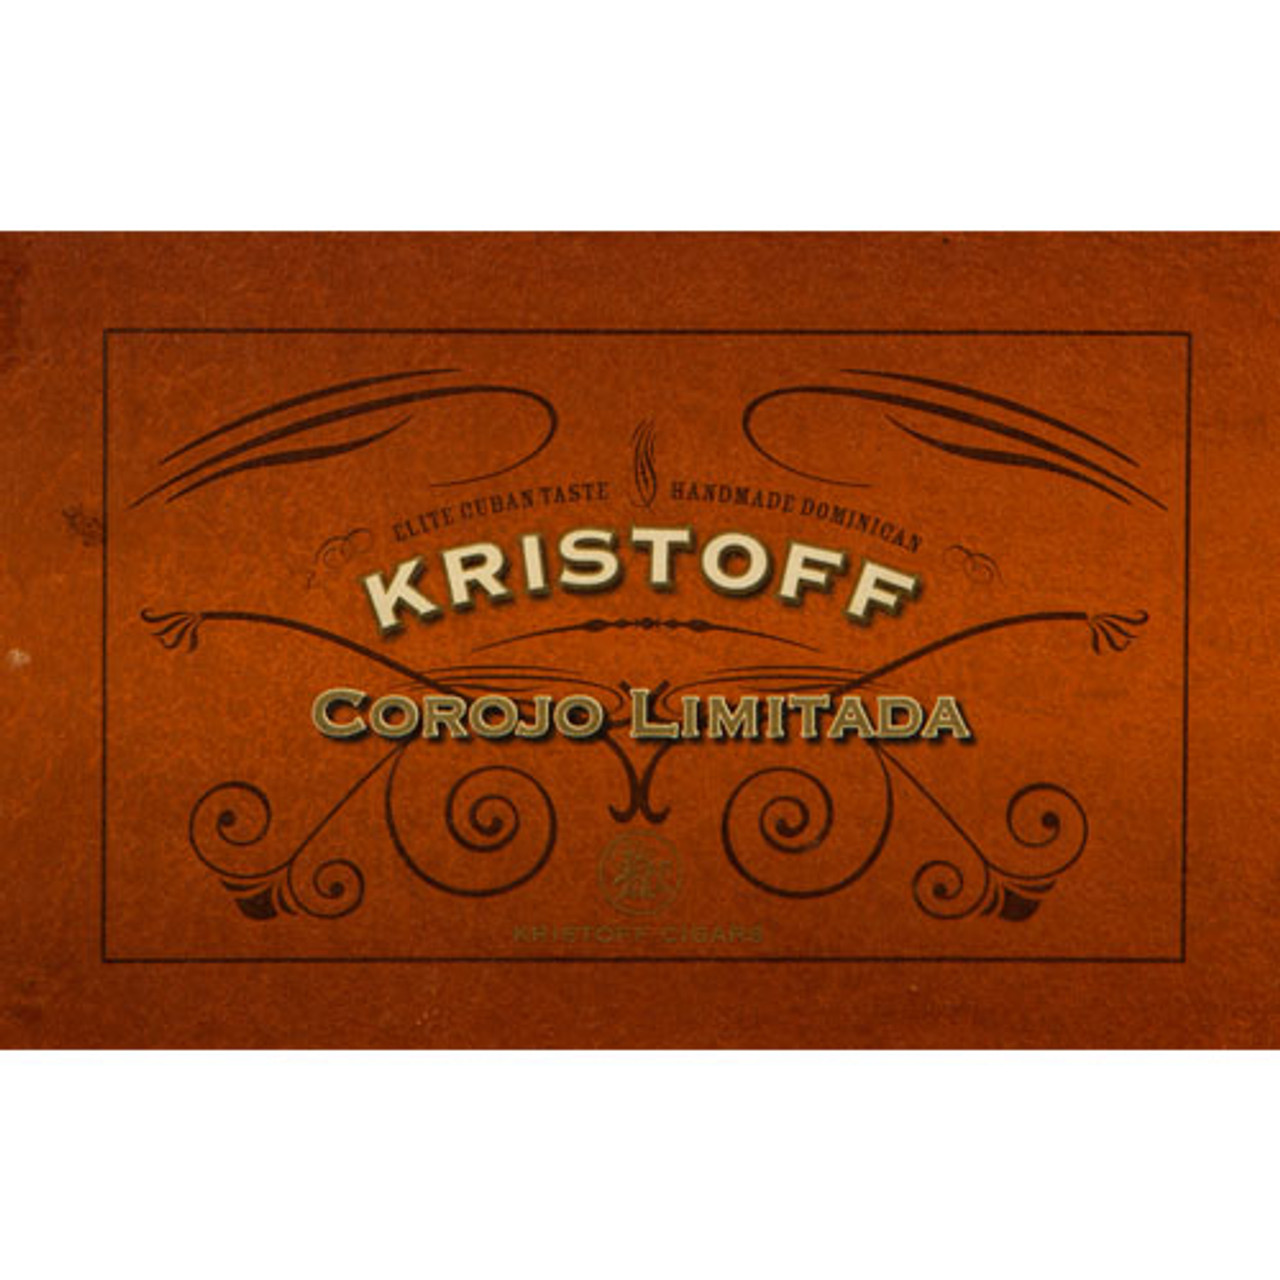 Kristoff Corojo Limitada Torpedo Cigars - 6.25 x 52 (Box of 20)